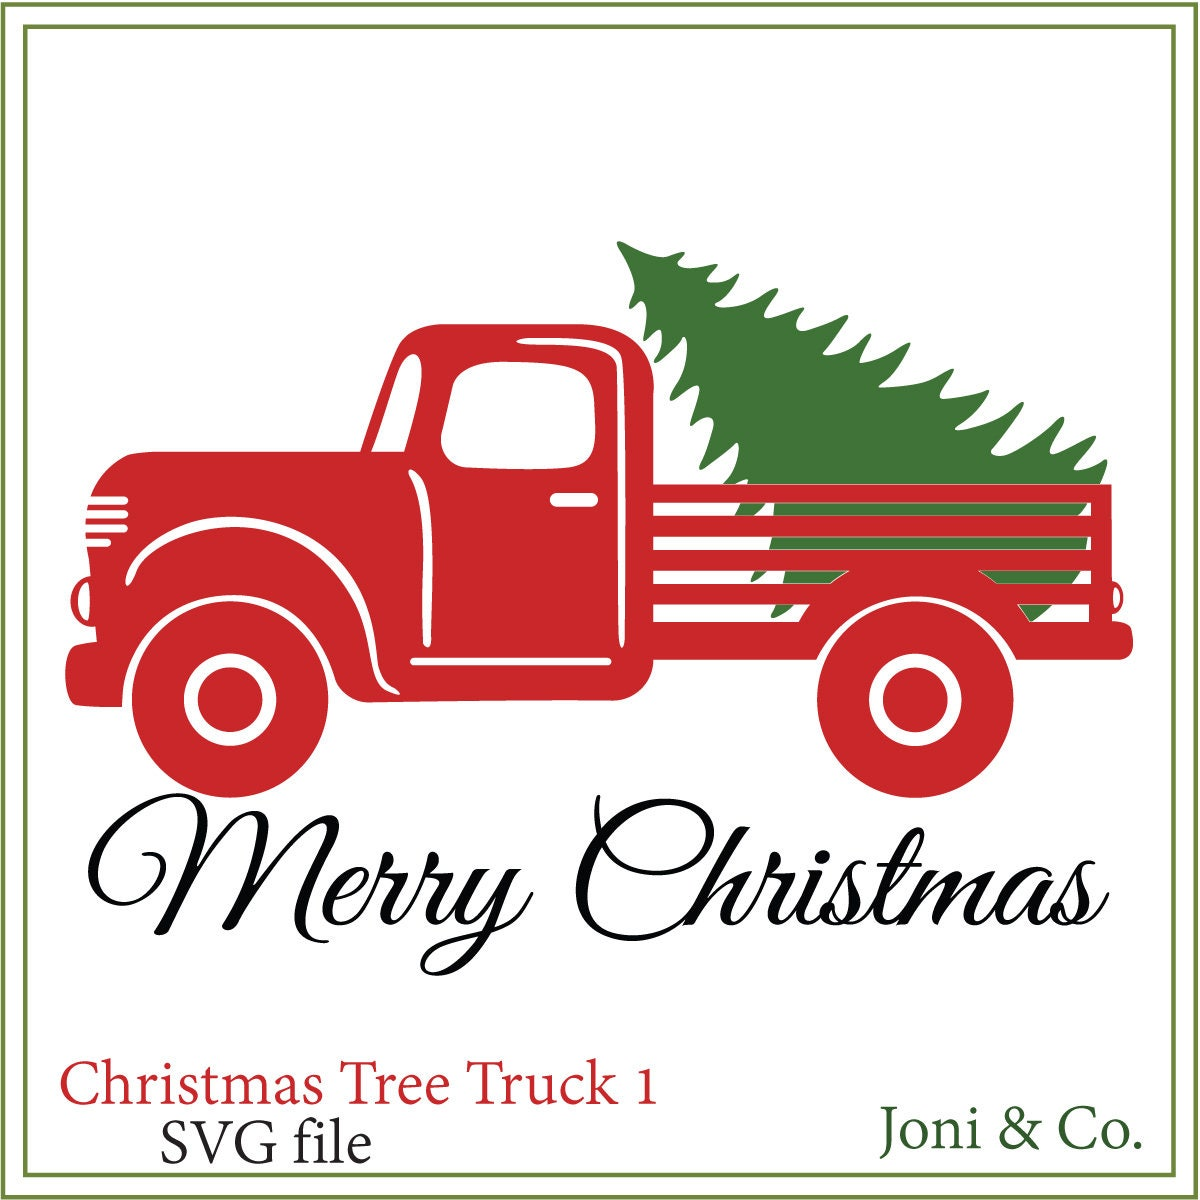 Christmas Tree Truck SVG Christmas truck Christmas signs